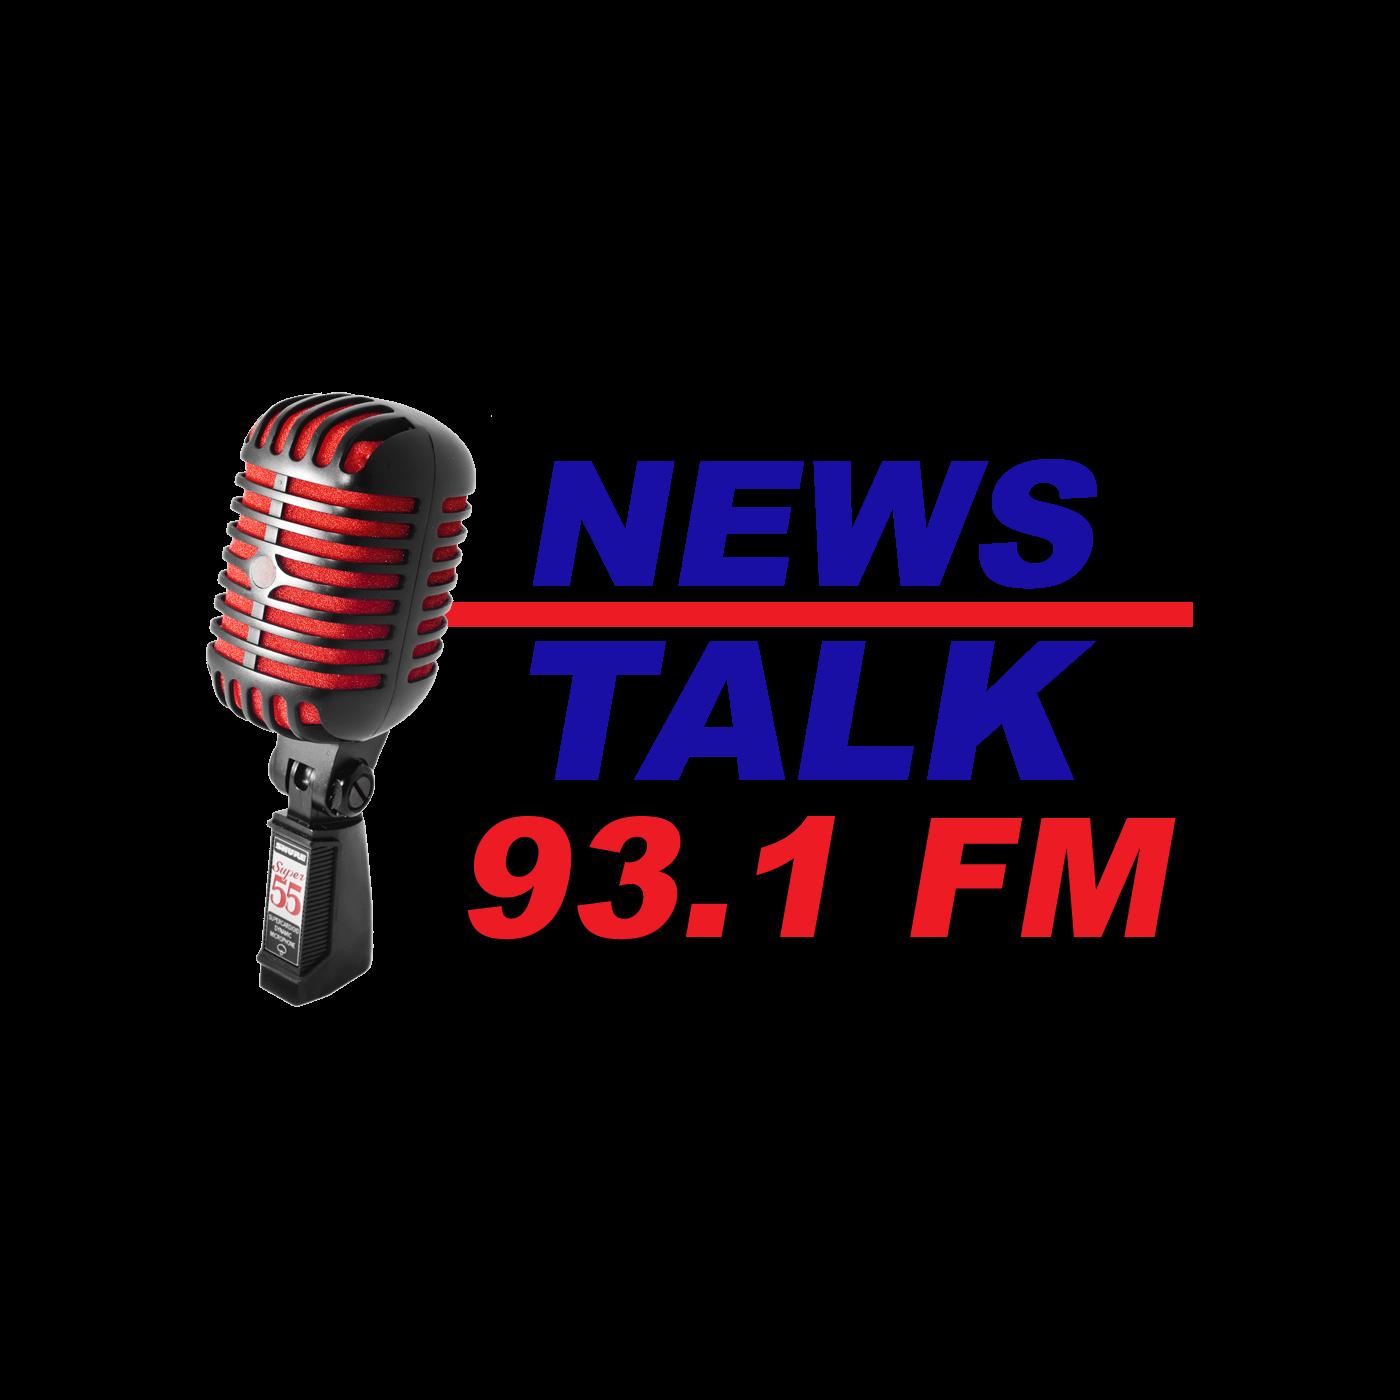 NewsTalk 93.1 - WACV Podcast